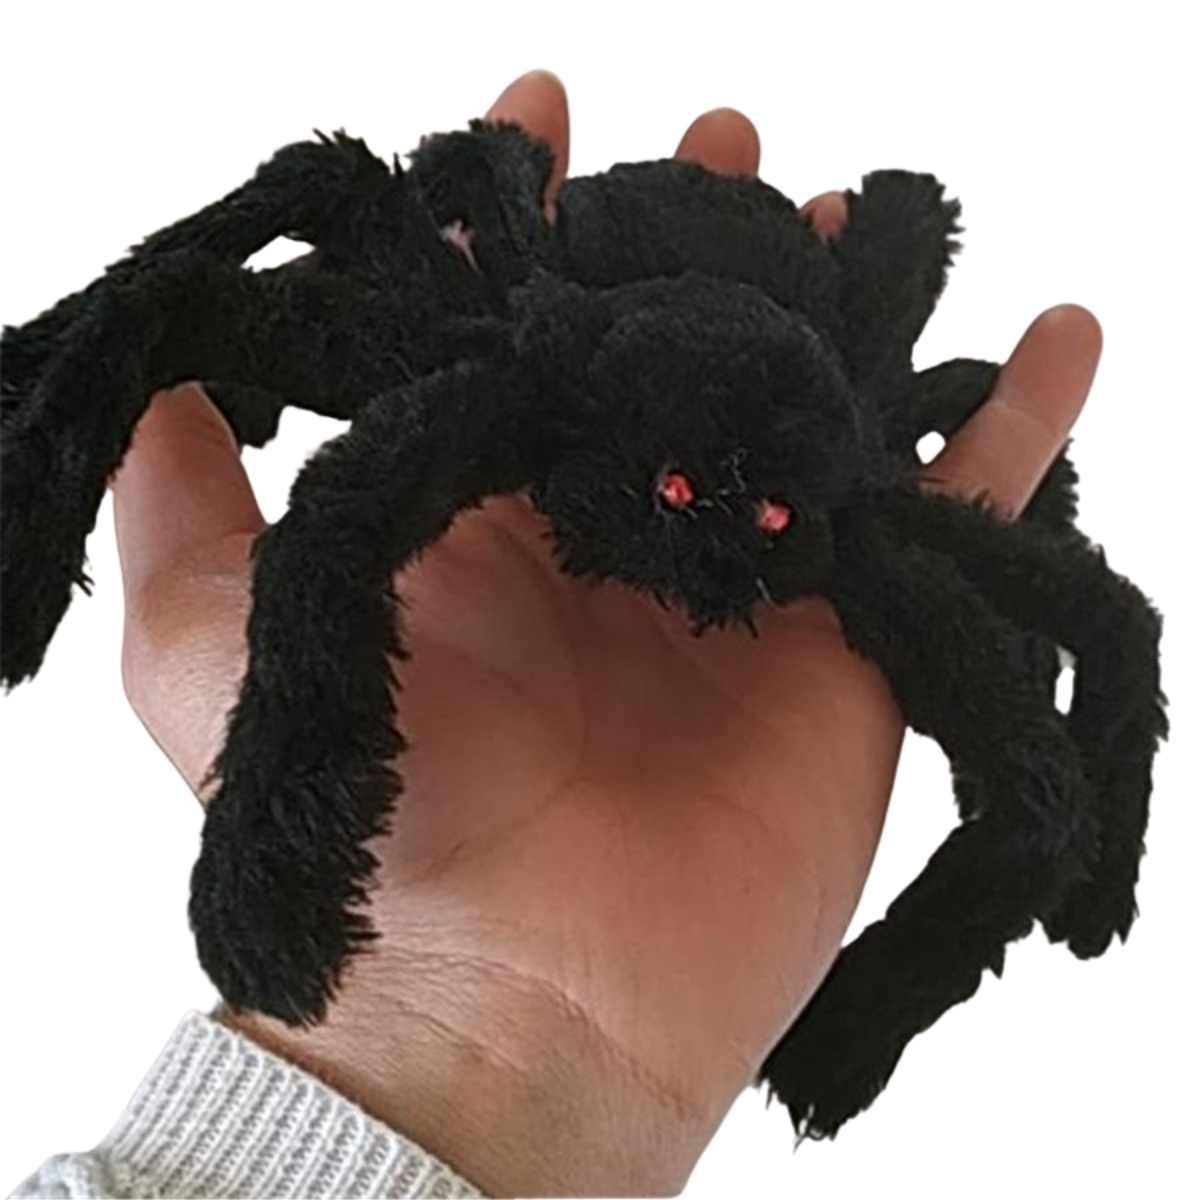 Aranha Peluciada Halloween 30cm